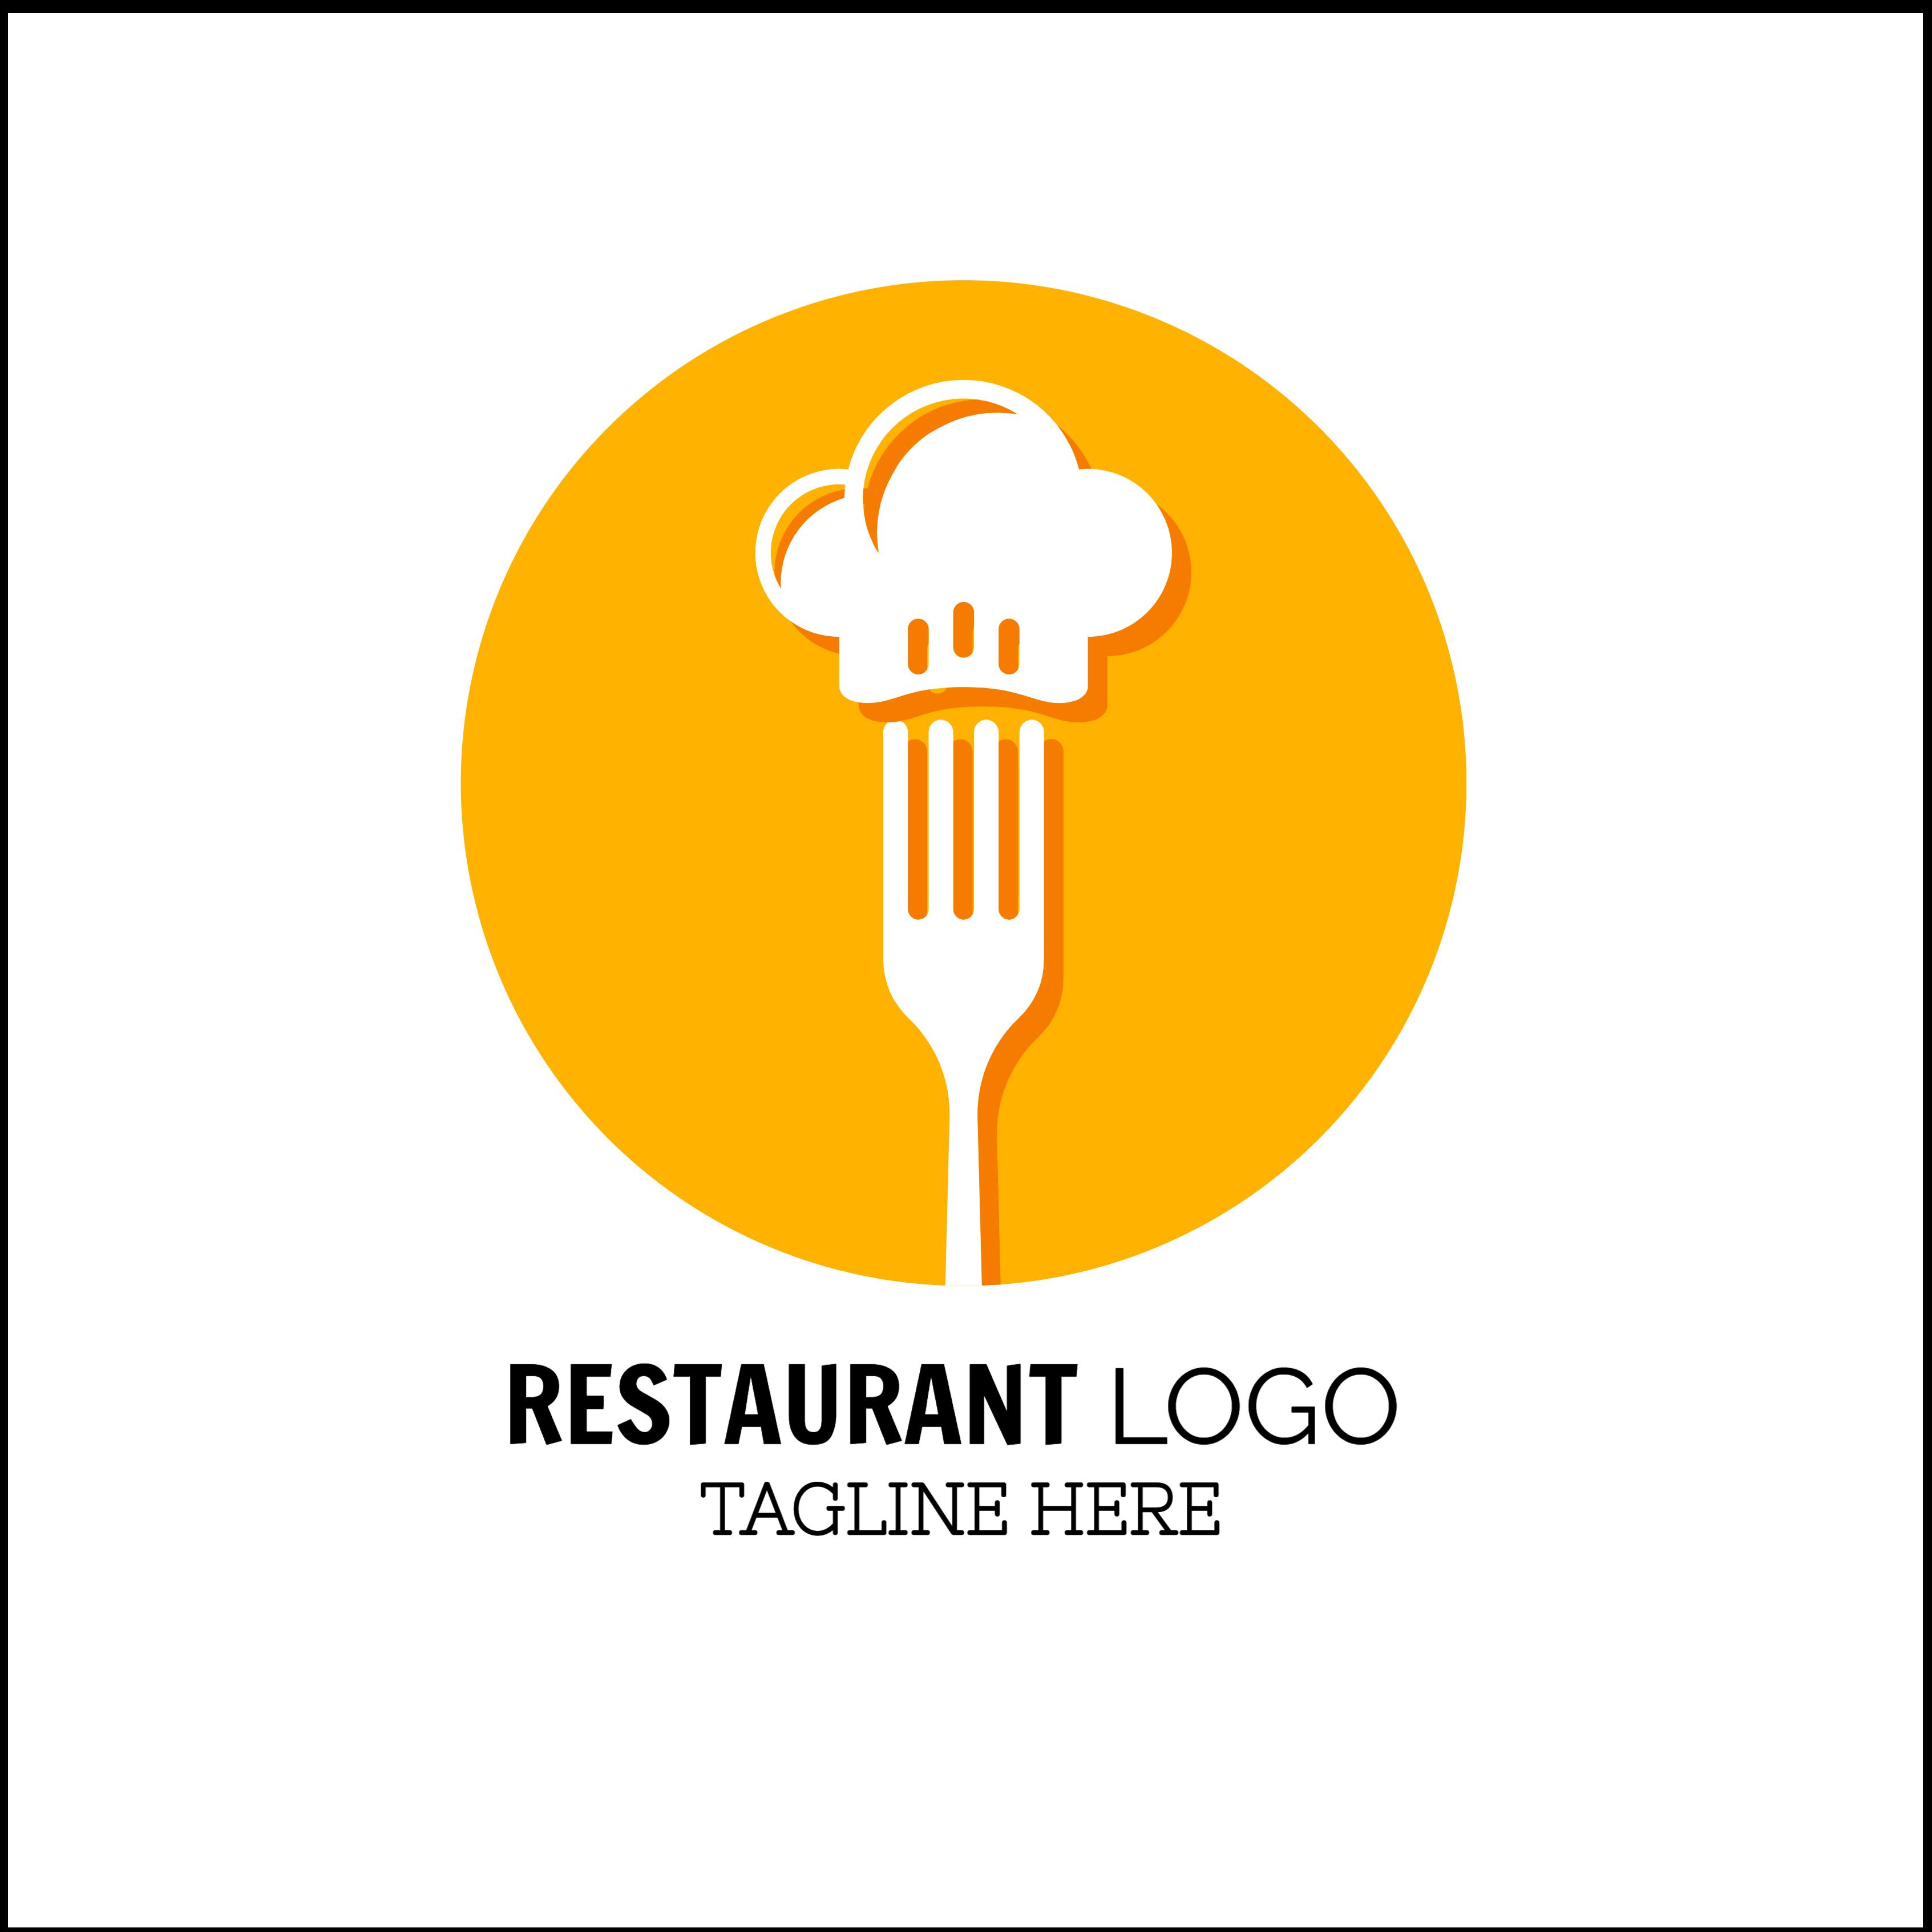 Best Restaurant Logo Template 2019.